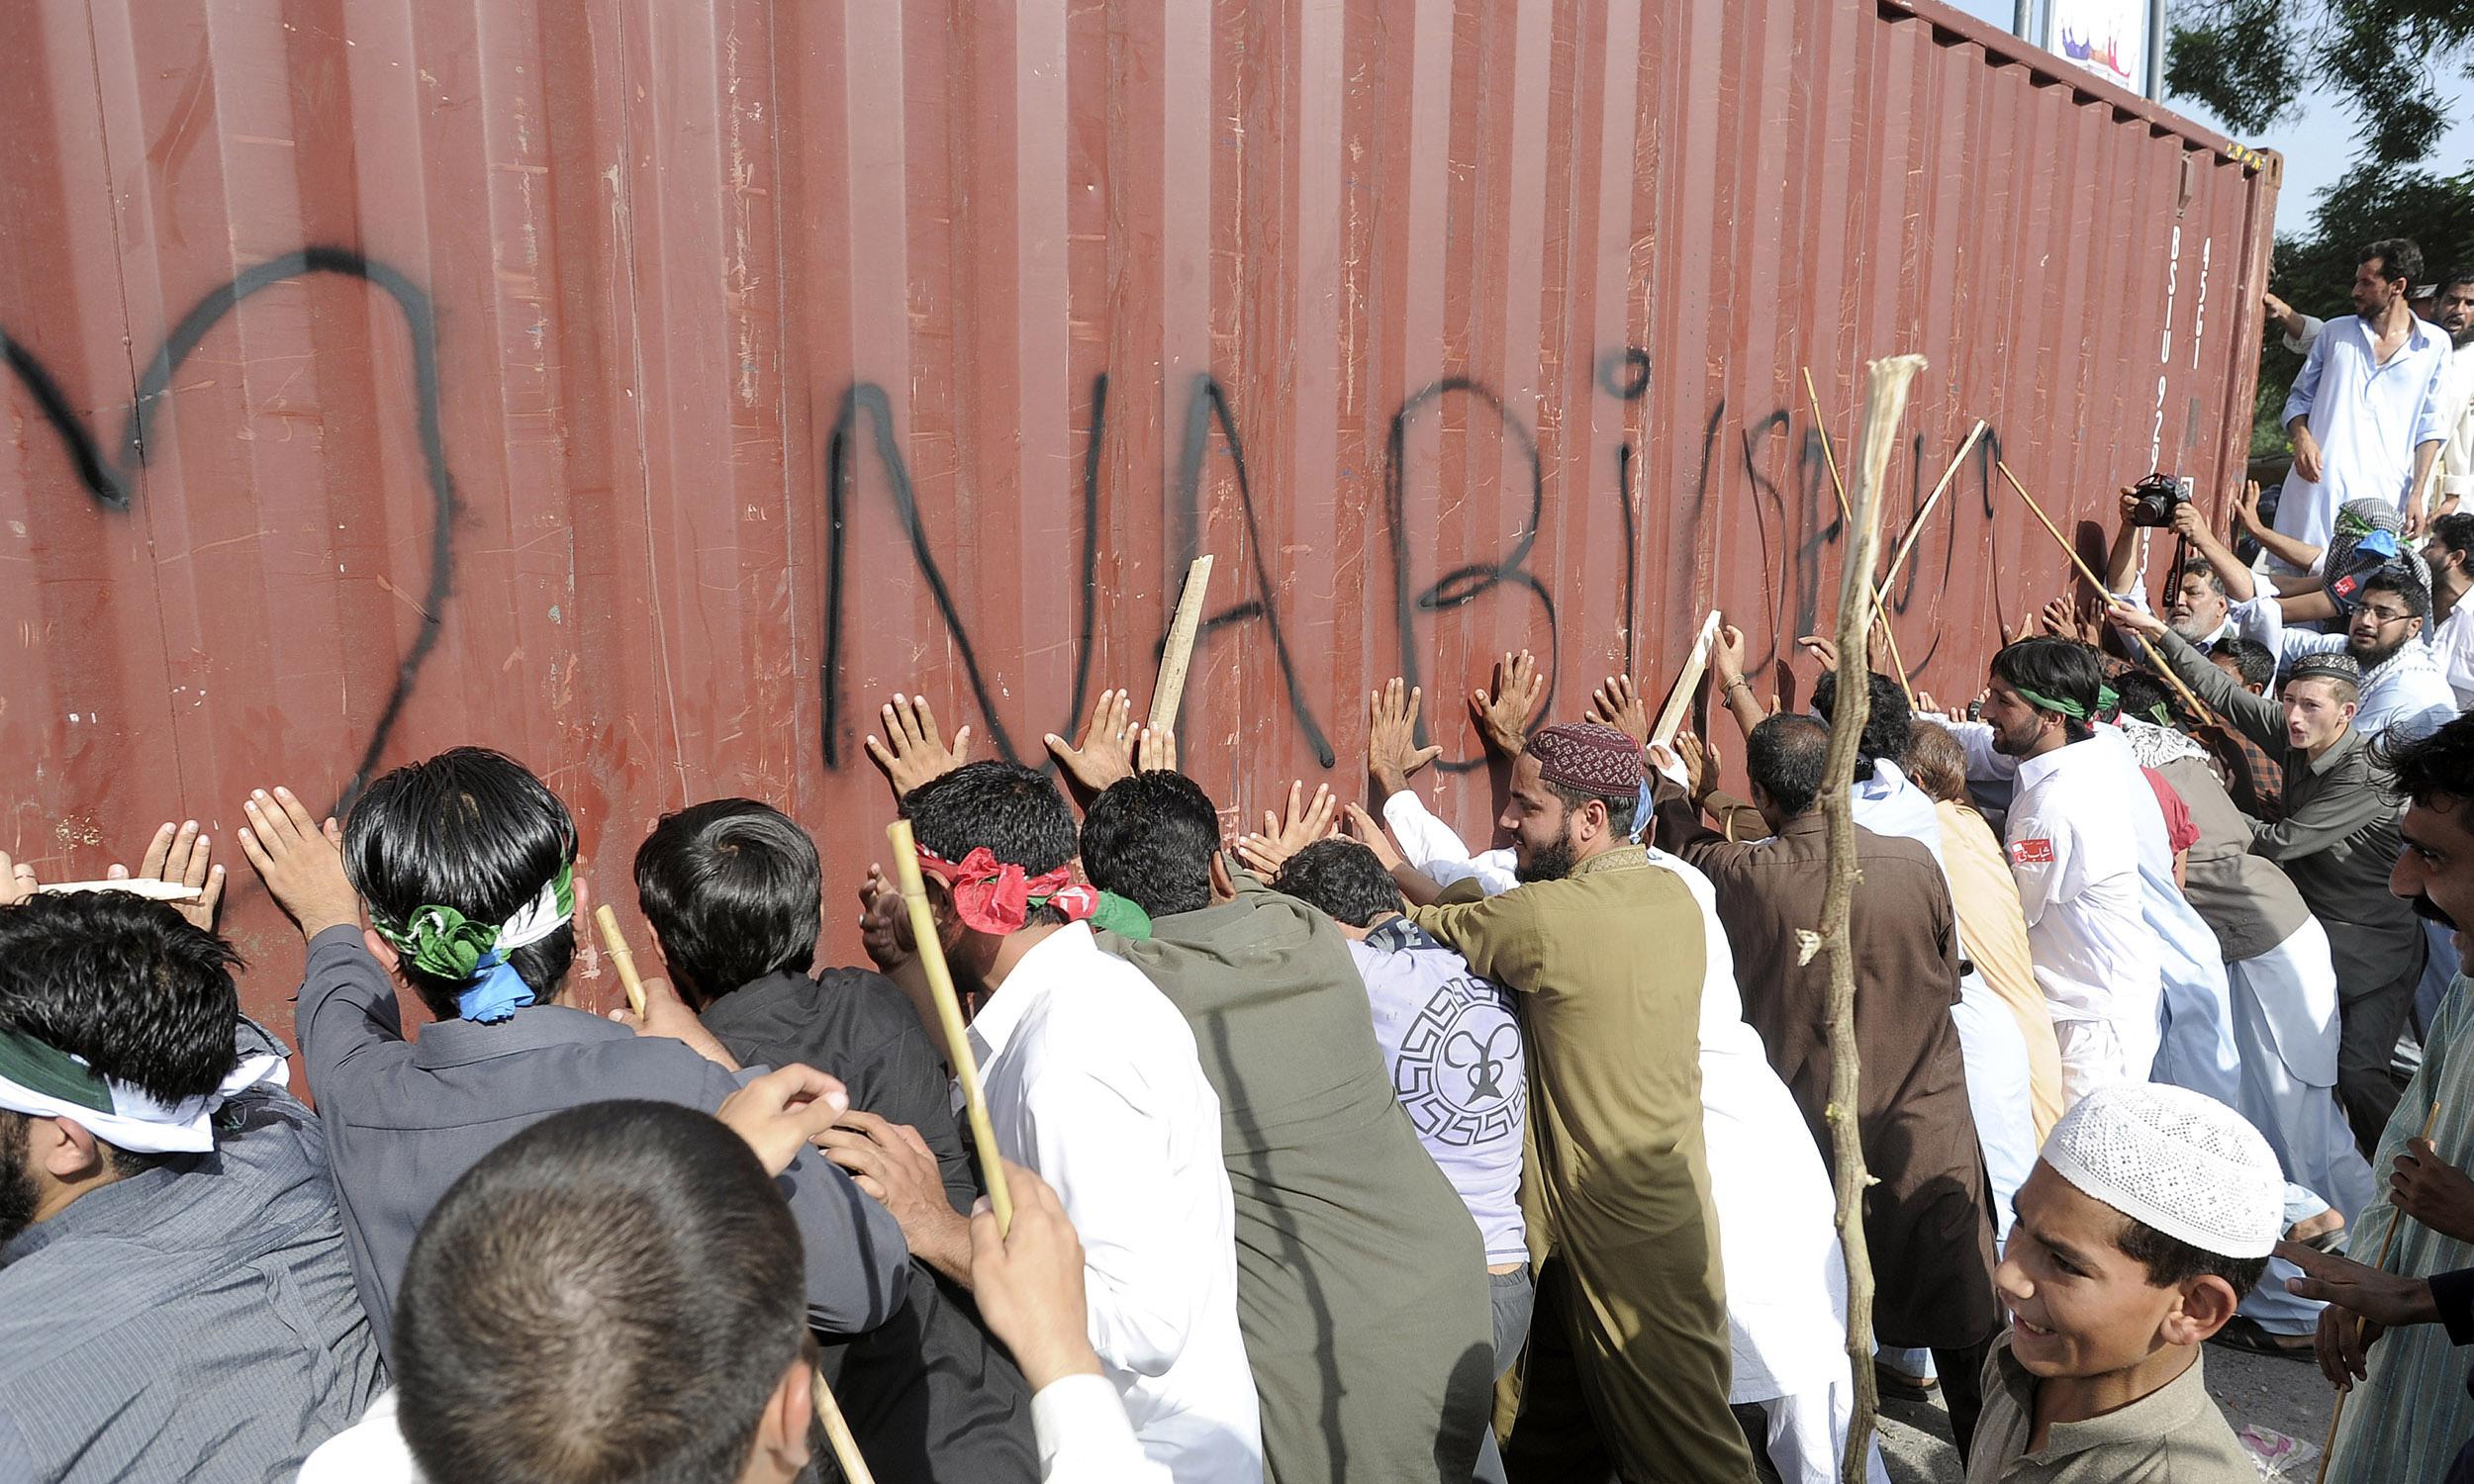 Anti-blasphemy protesters in Islamabad|Tanveer Shahzad, White Star